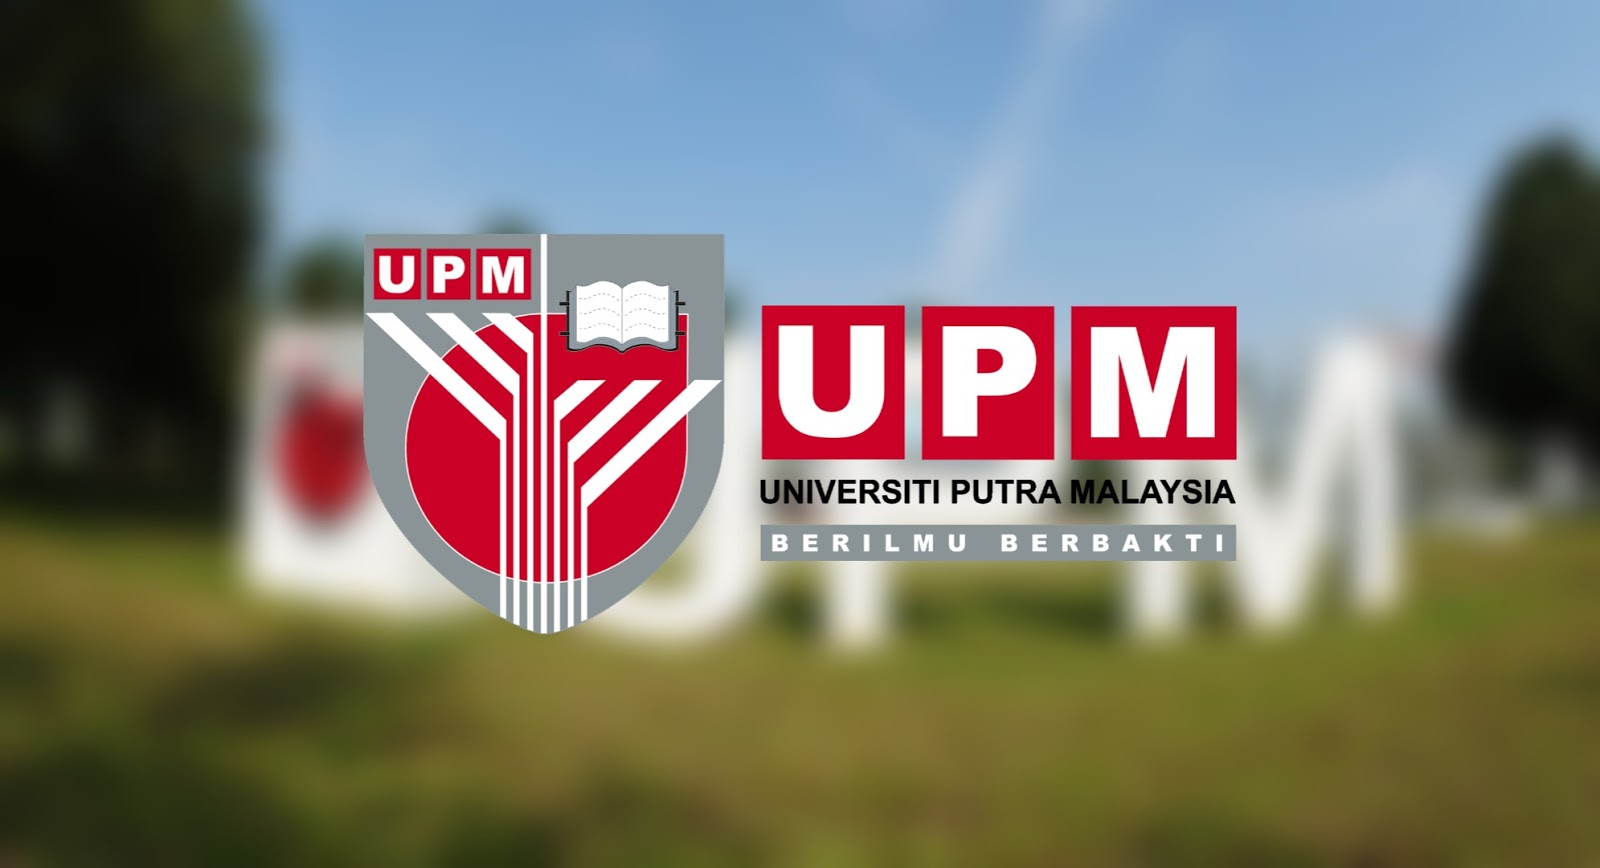 Permohonan UPM 2020 Online (Universiti Putra Malaysia)